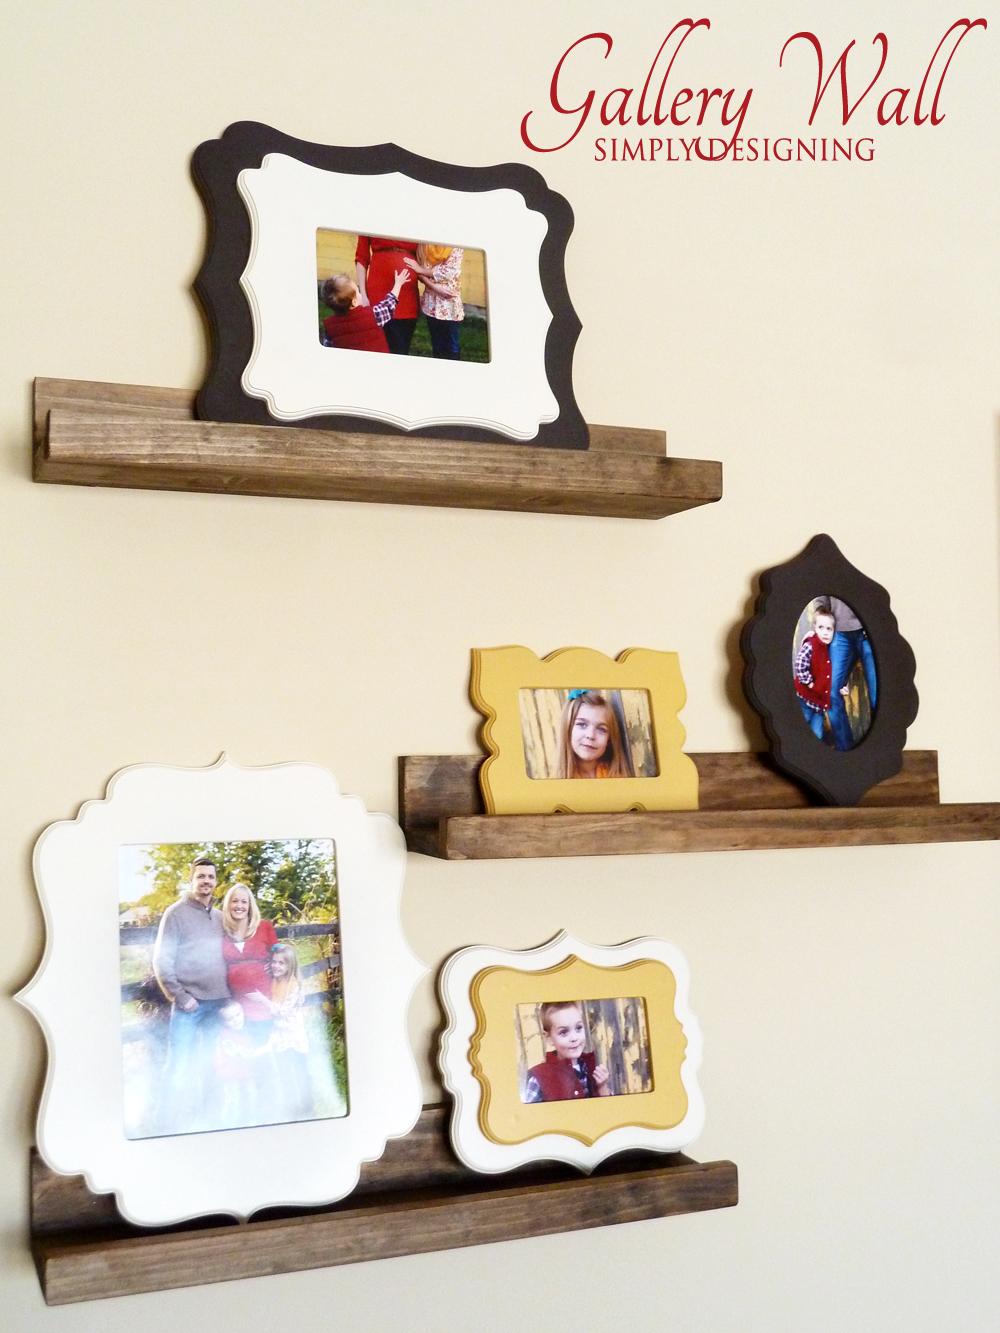 Chic Frames for Gallery Wall | #homedecor #frames #gallerywall